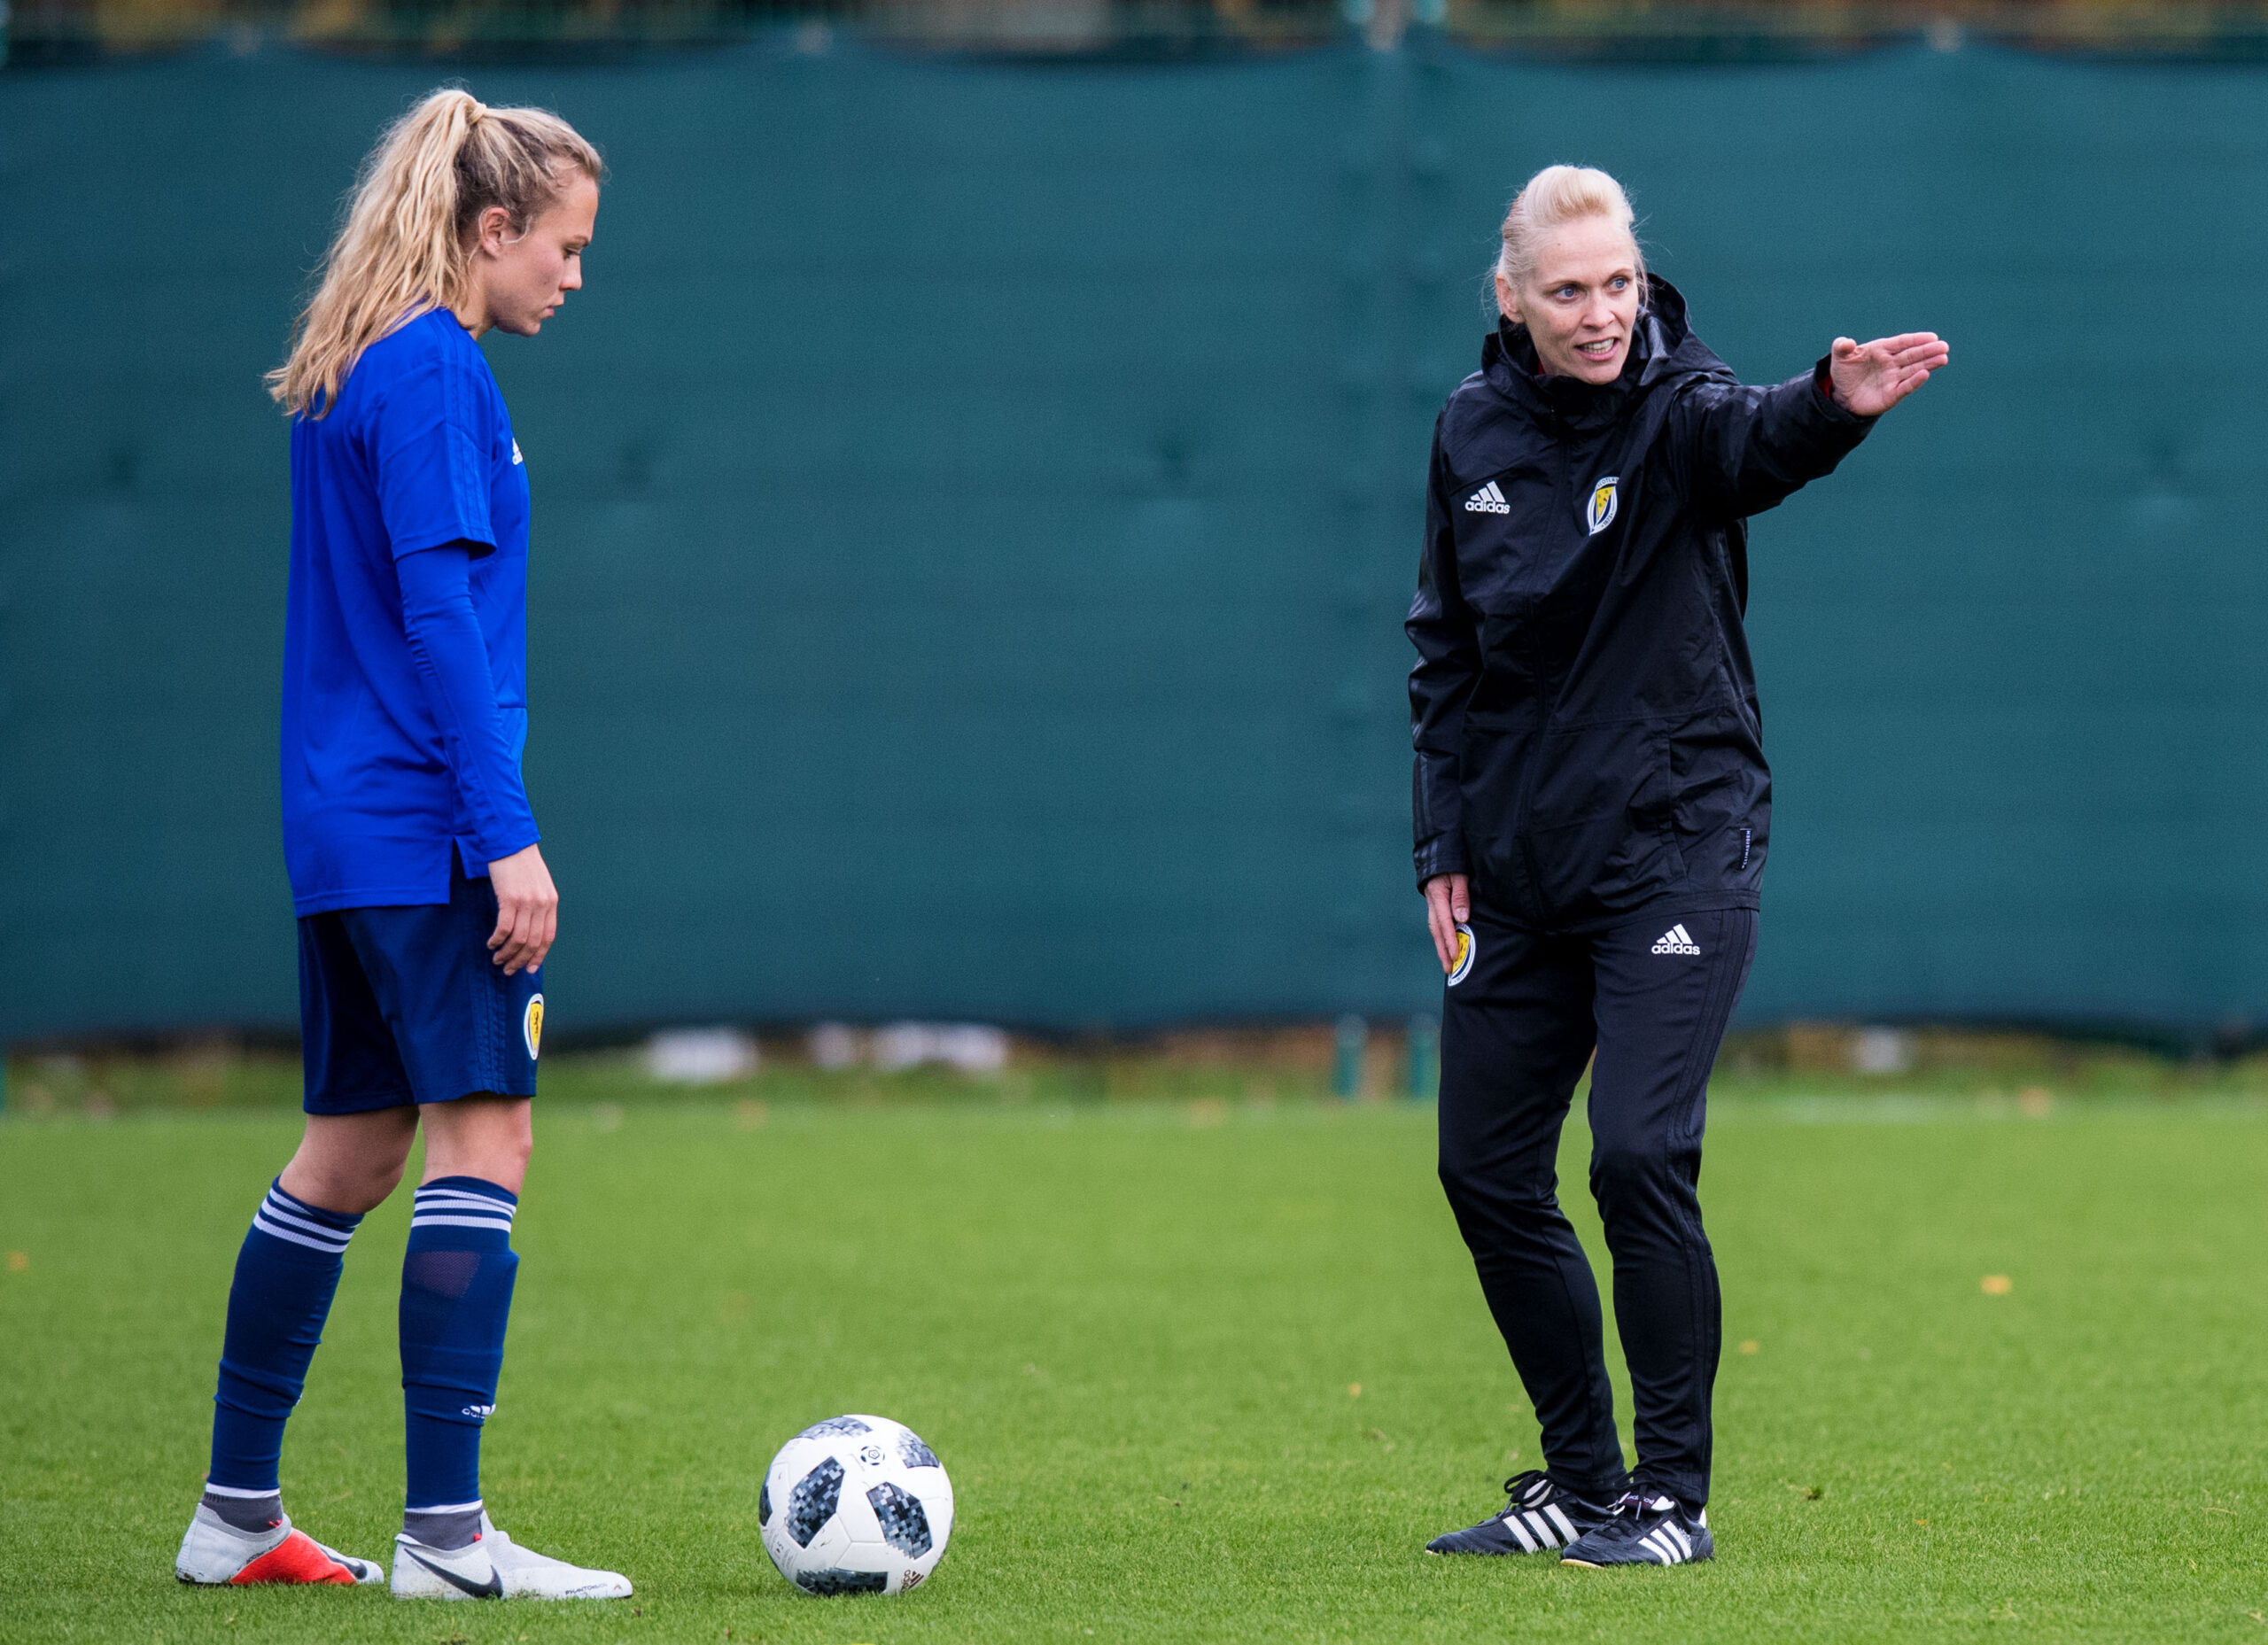 Edinburgh Napier Football Coaching, Performance & Development Degree